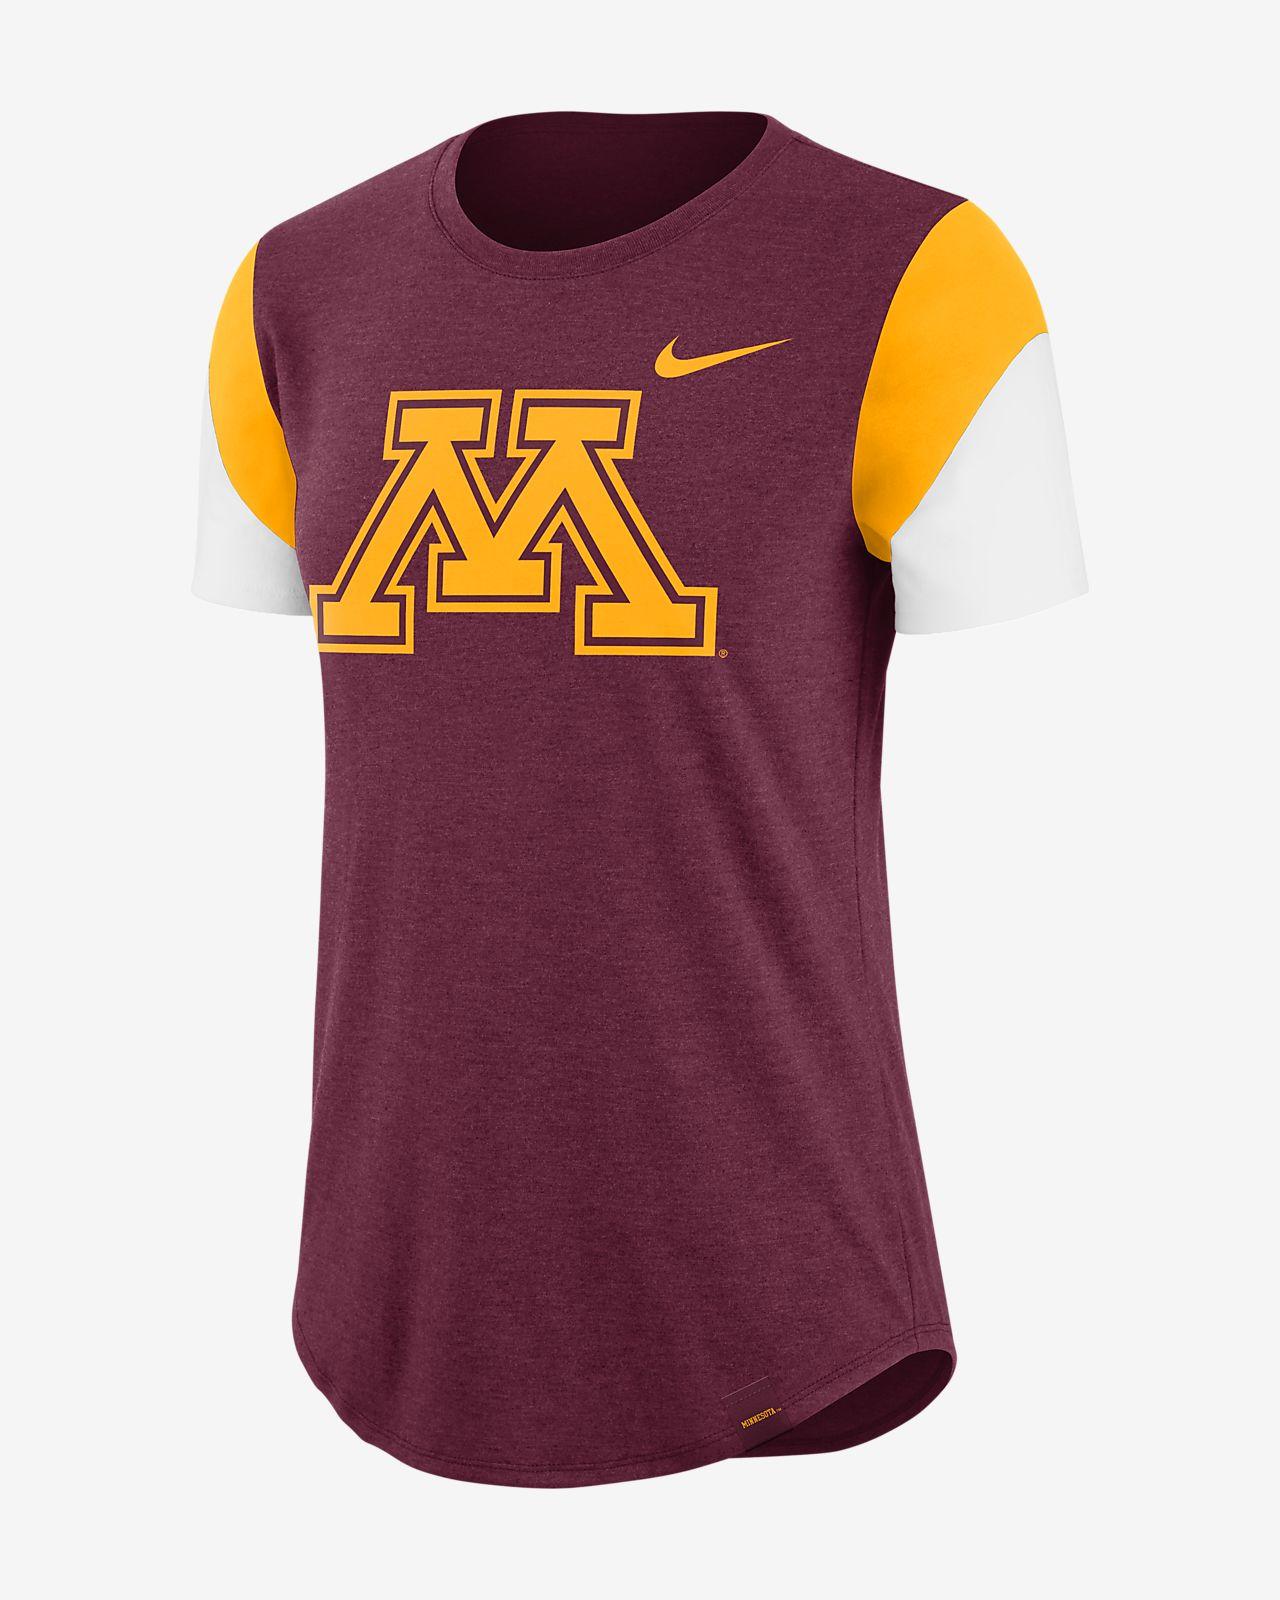 Nike College Fan (Minnesota) Women s Tri-Blend T-Shirt. Nike.com 6a8b0986a